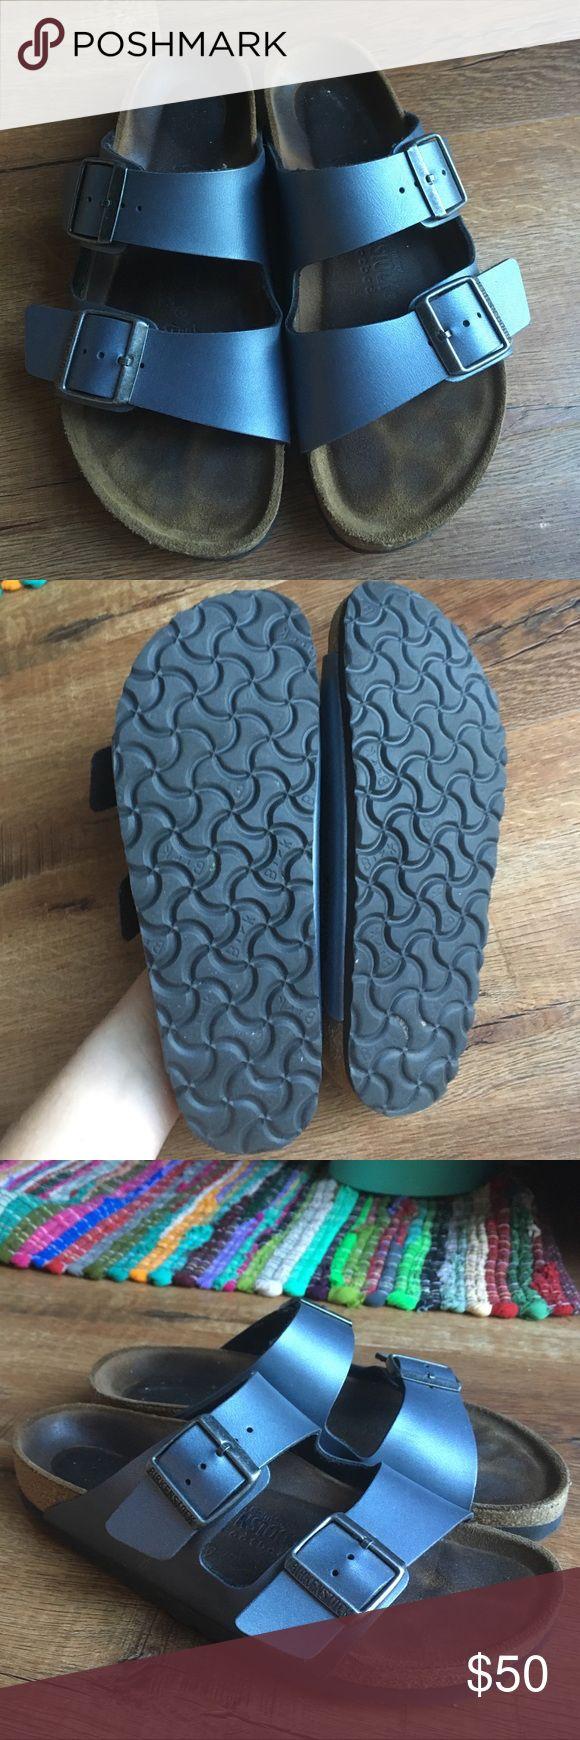 Birkenstock metallic Blue Sandals Suede footbed, minimum wear, soles are like new. Birkenstock Shoes Sandals